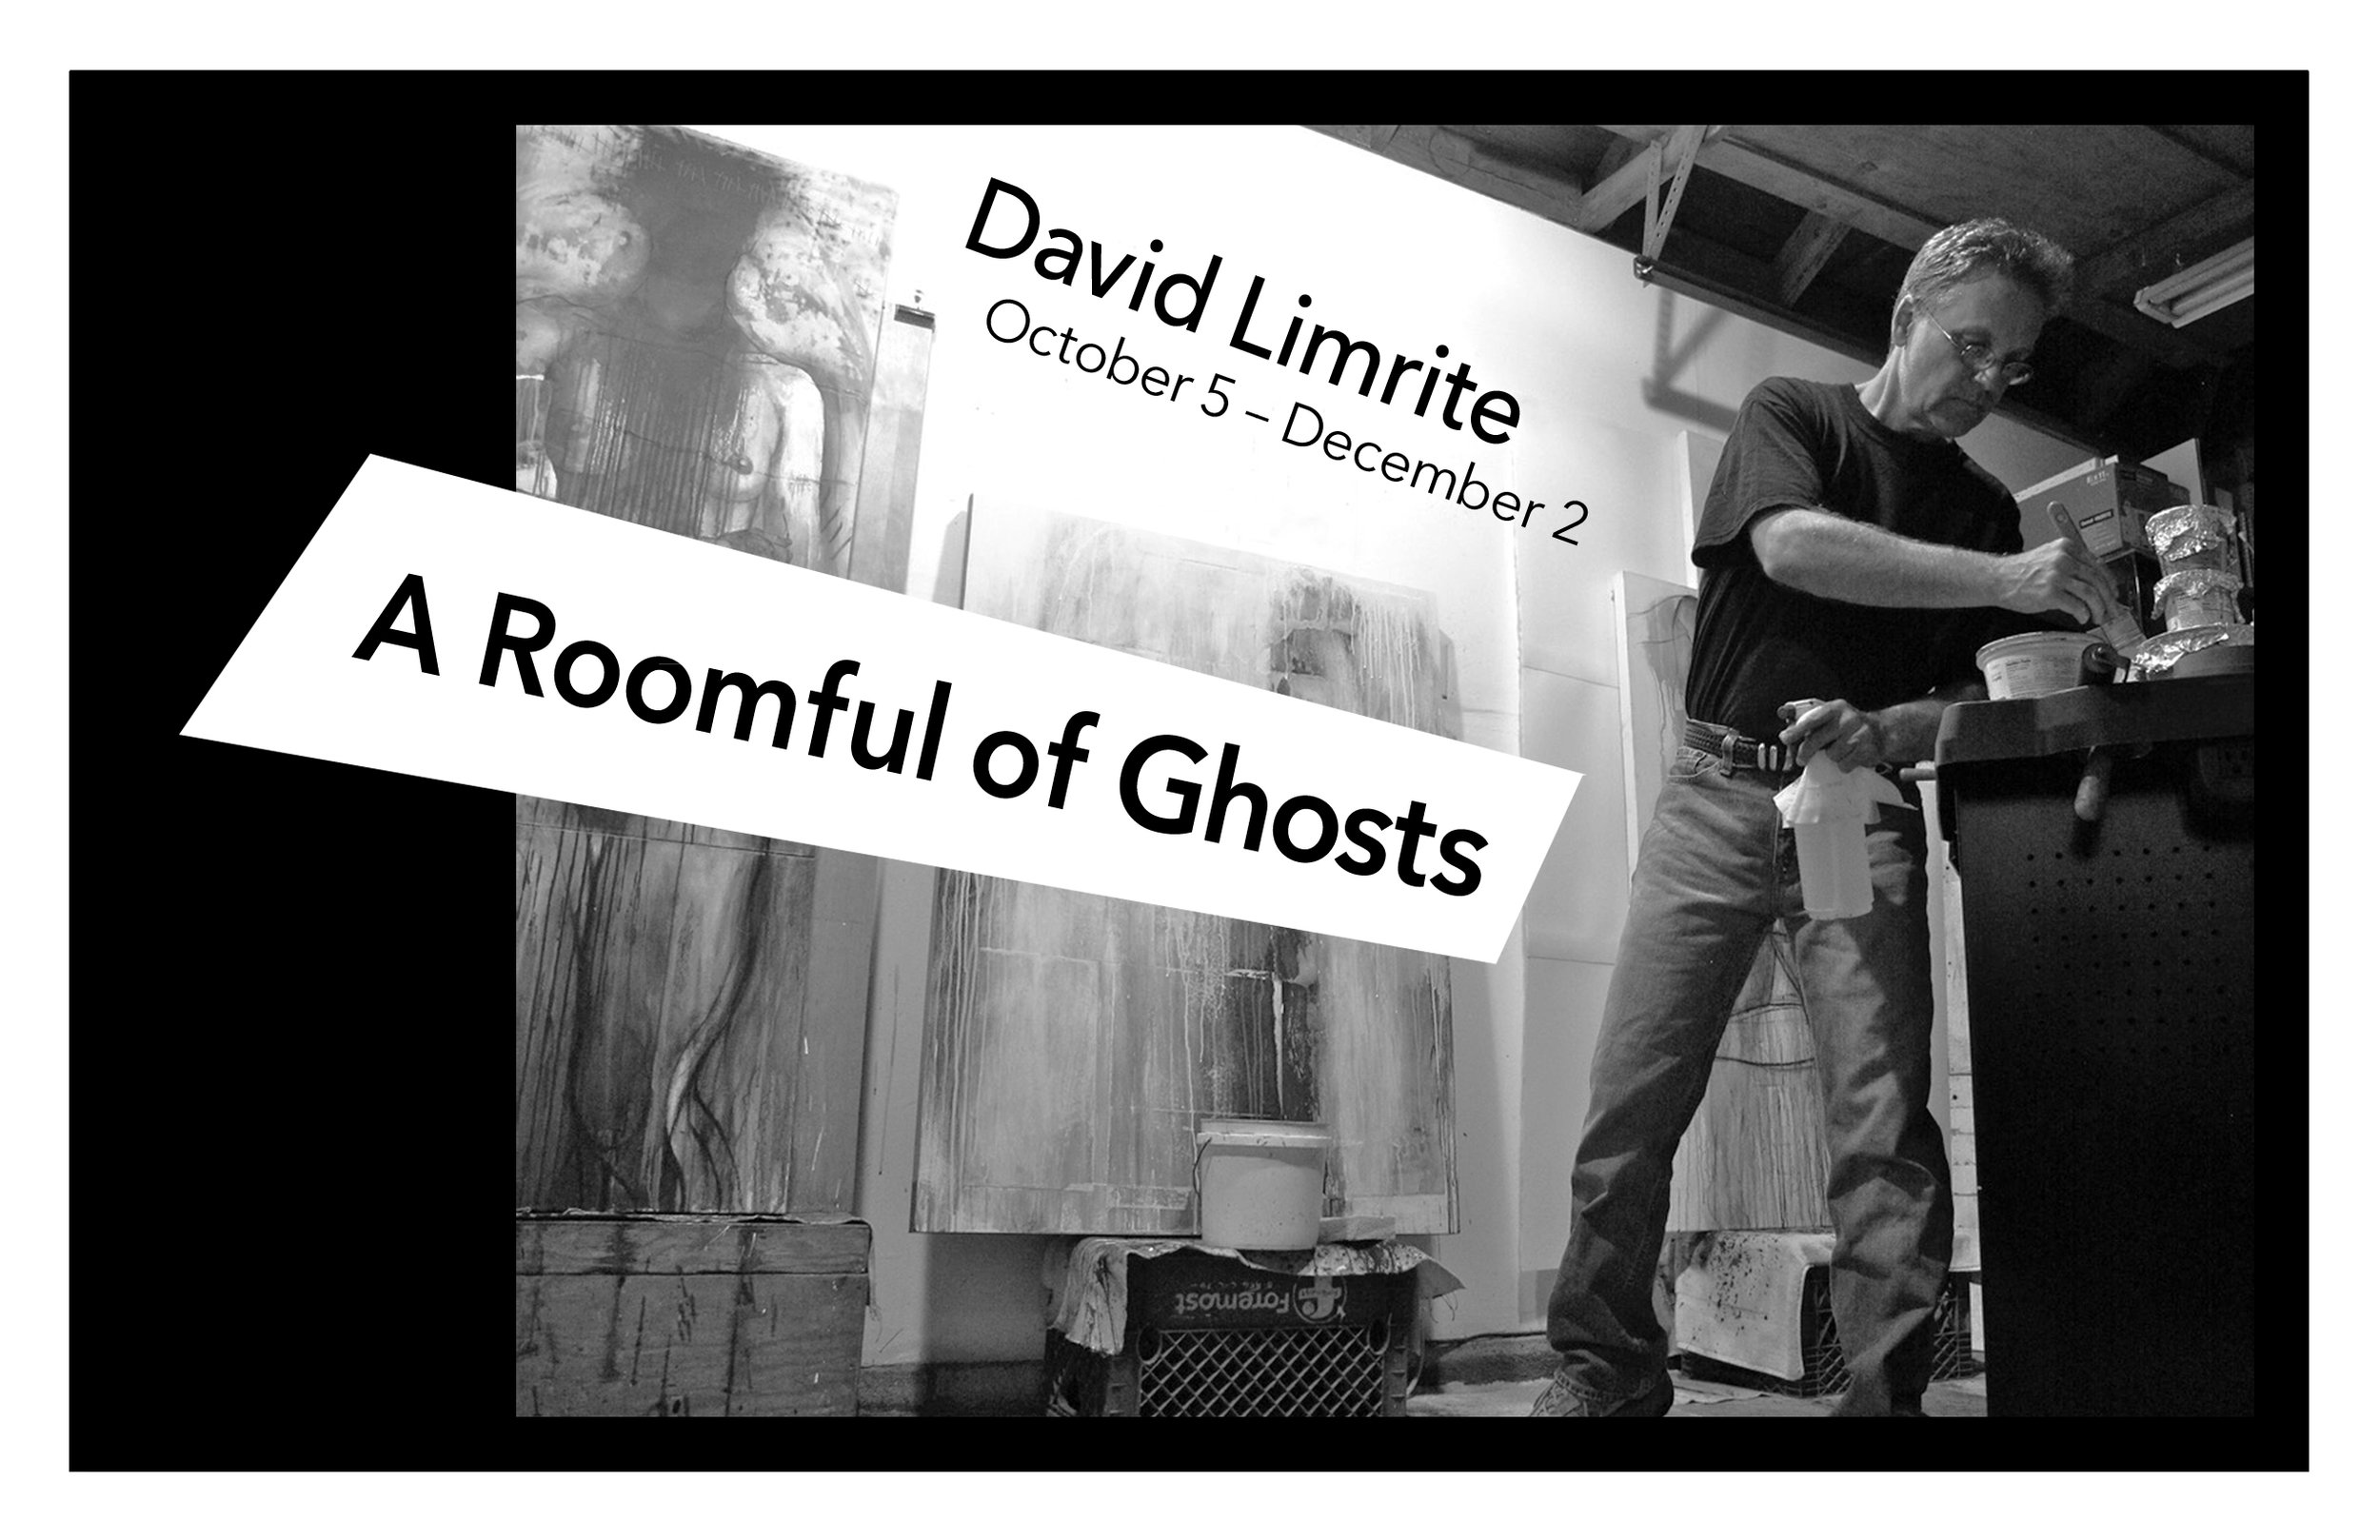 David-Limrite-Roomful-of-Ghosts-Postcard.jpg